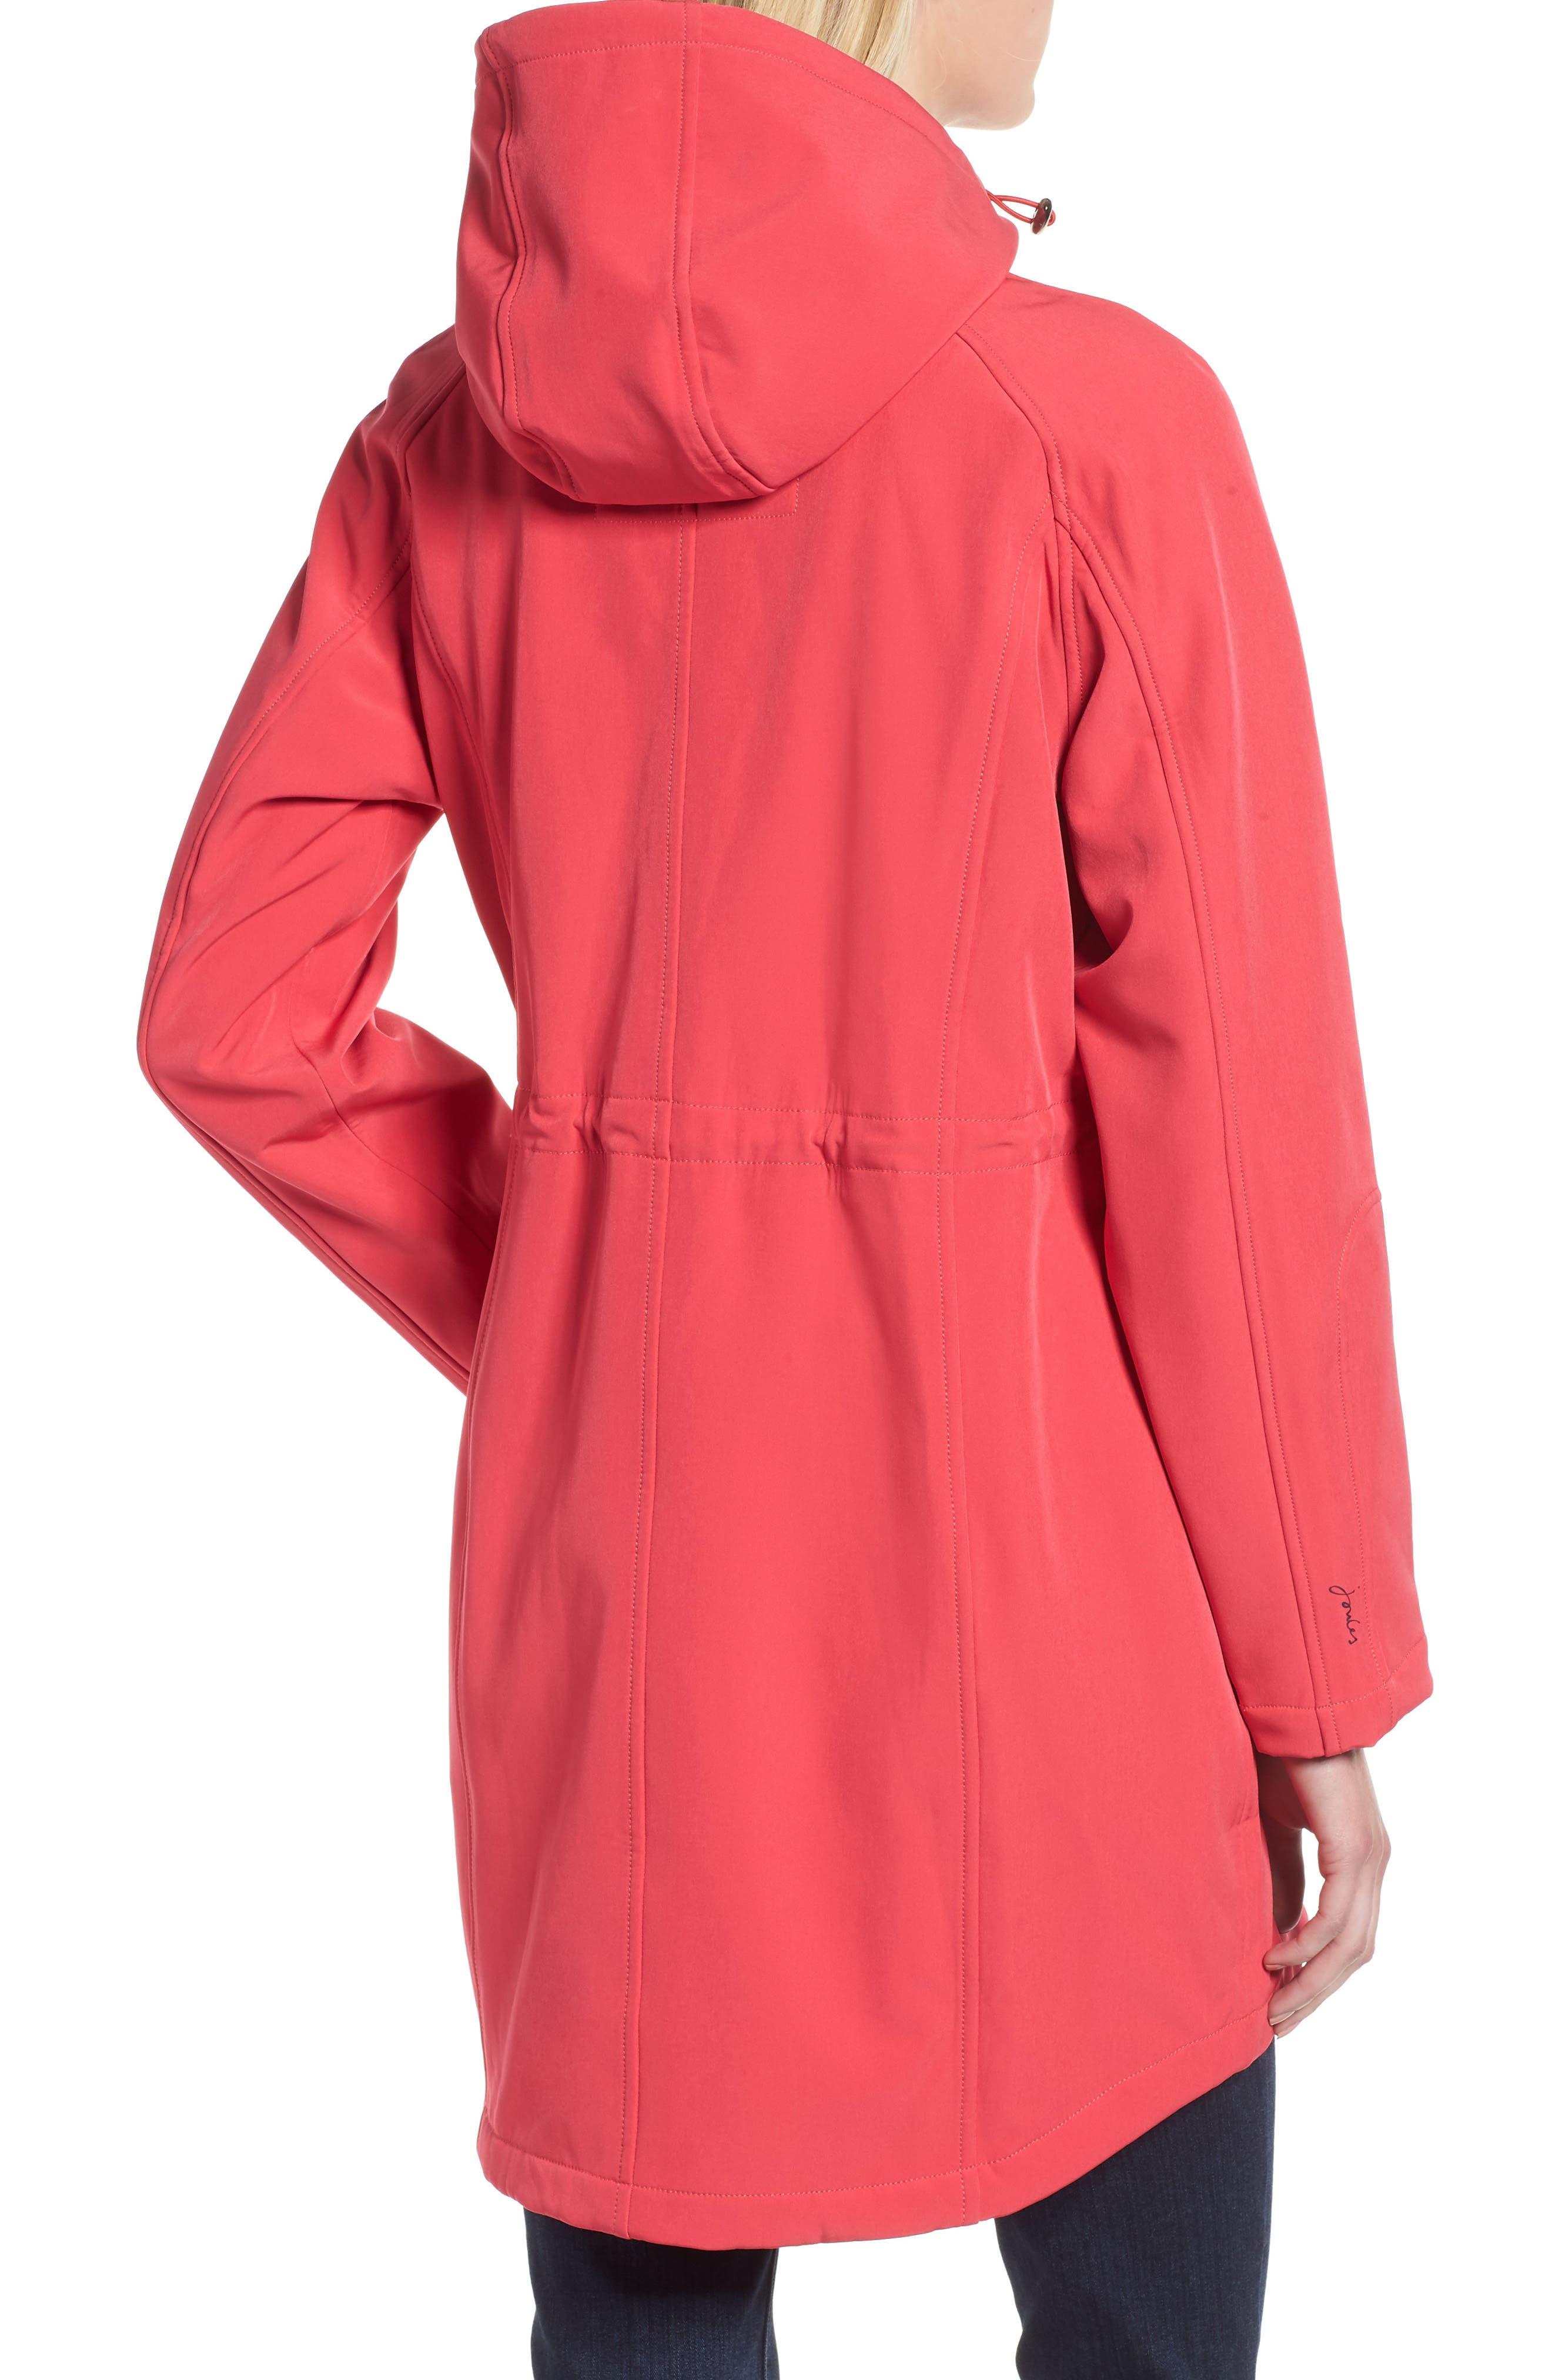 Right as Rain Fleece Lined Raincoat,                             Alternate thumbnail 7, color,